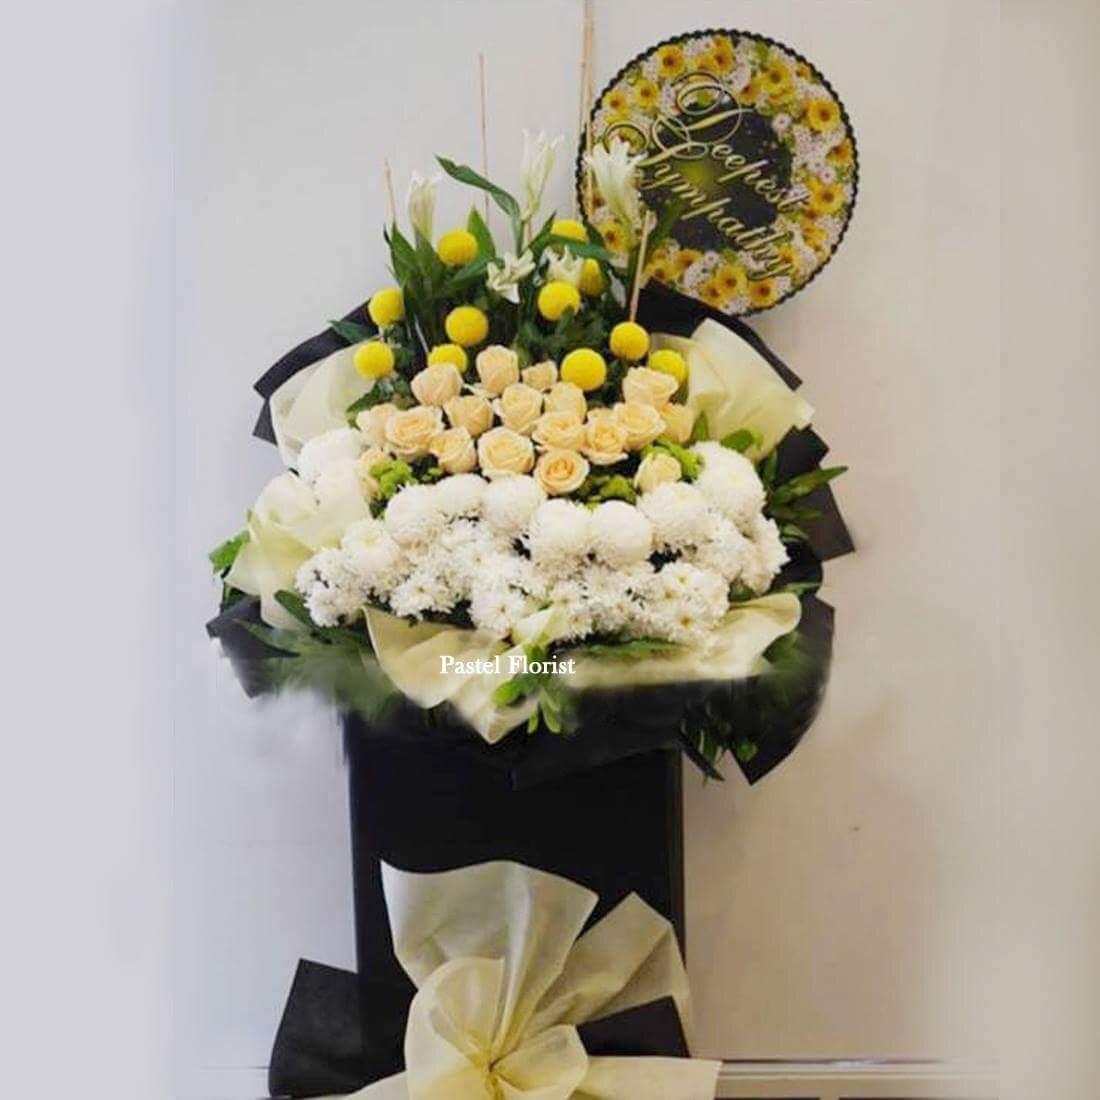 Condolences stand 19 pastel flower gifts flower bouquet condolences stand 19 izmirmasajfo